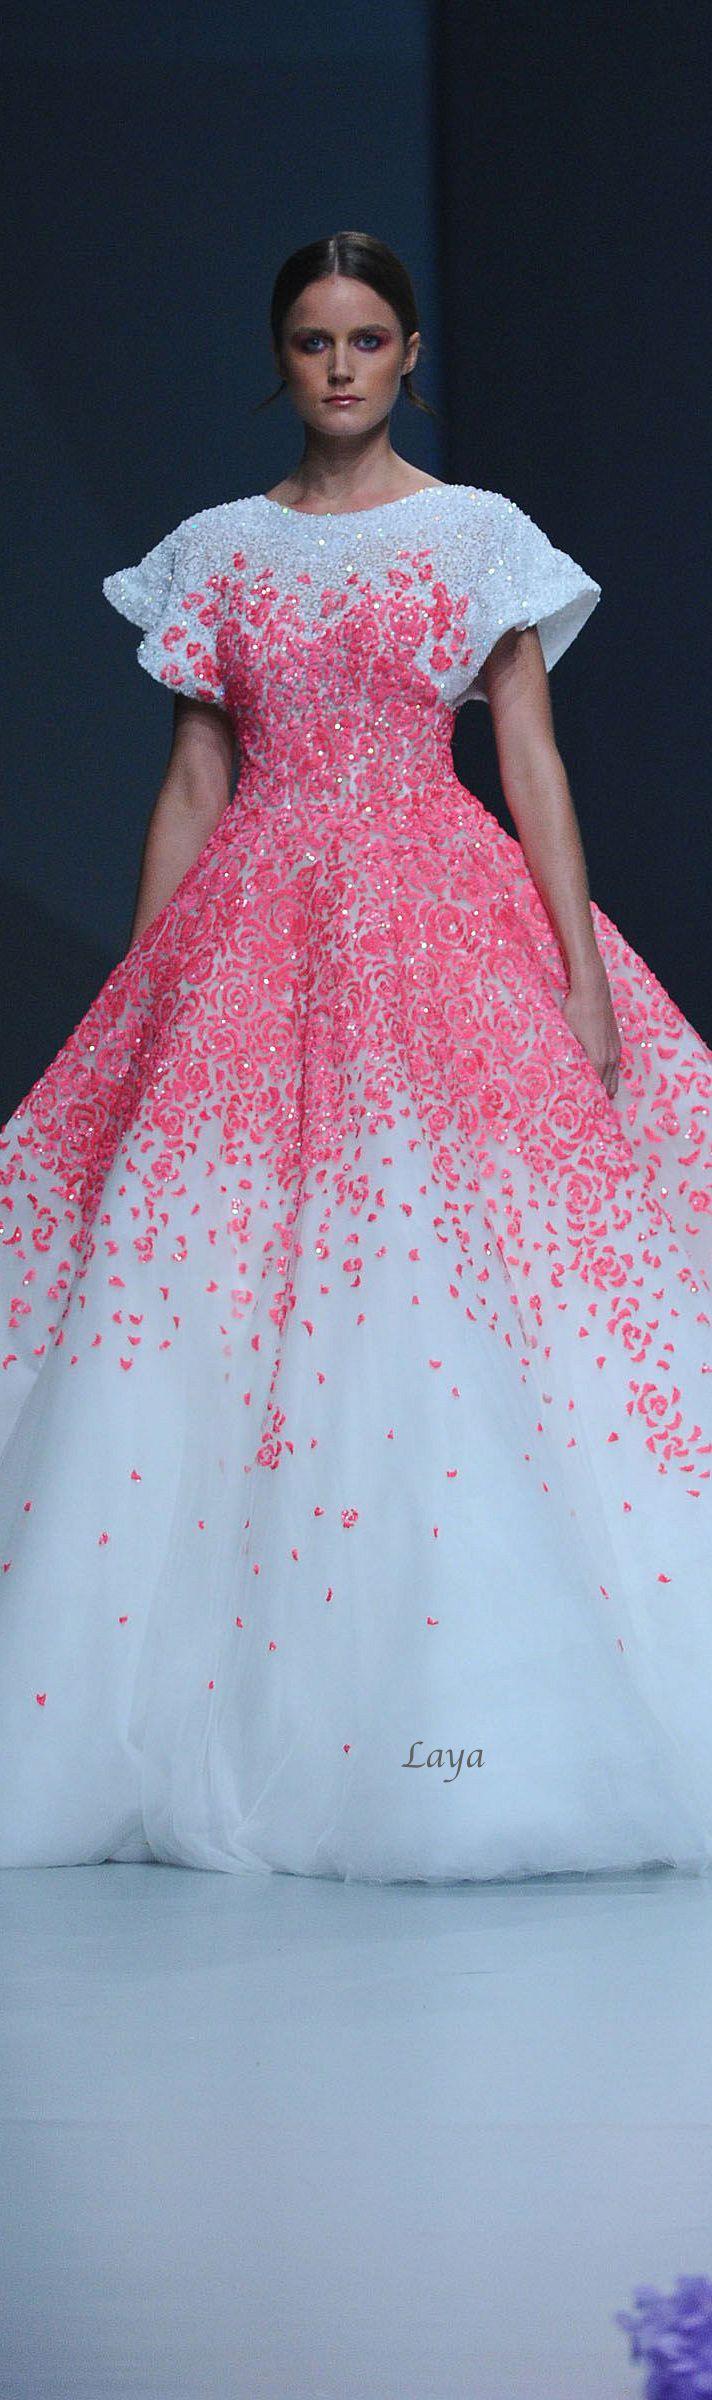 41 best Michael Cinco images on Pinterest | Alta costura, Vestidos ...